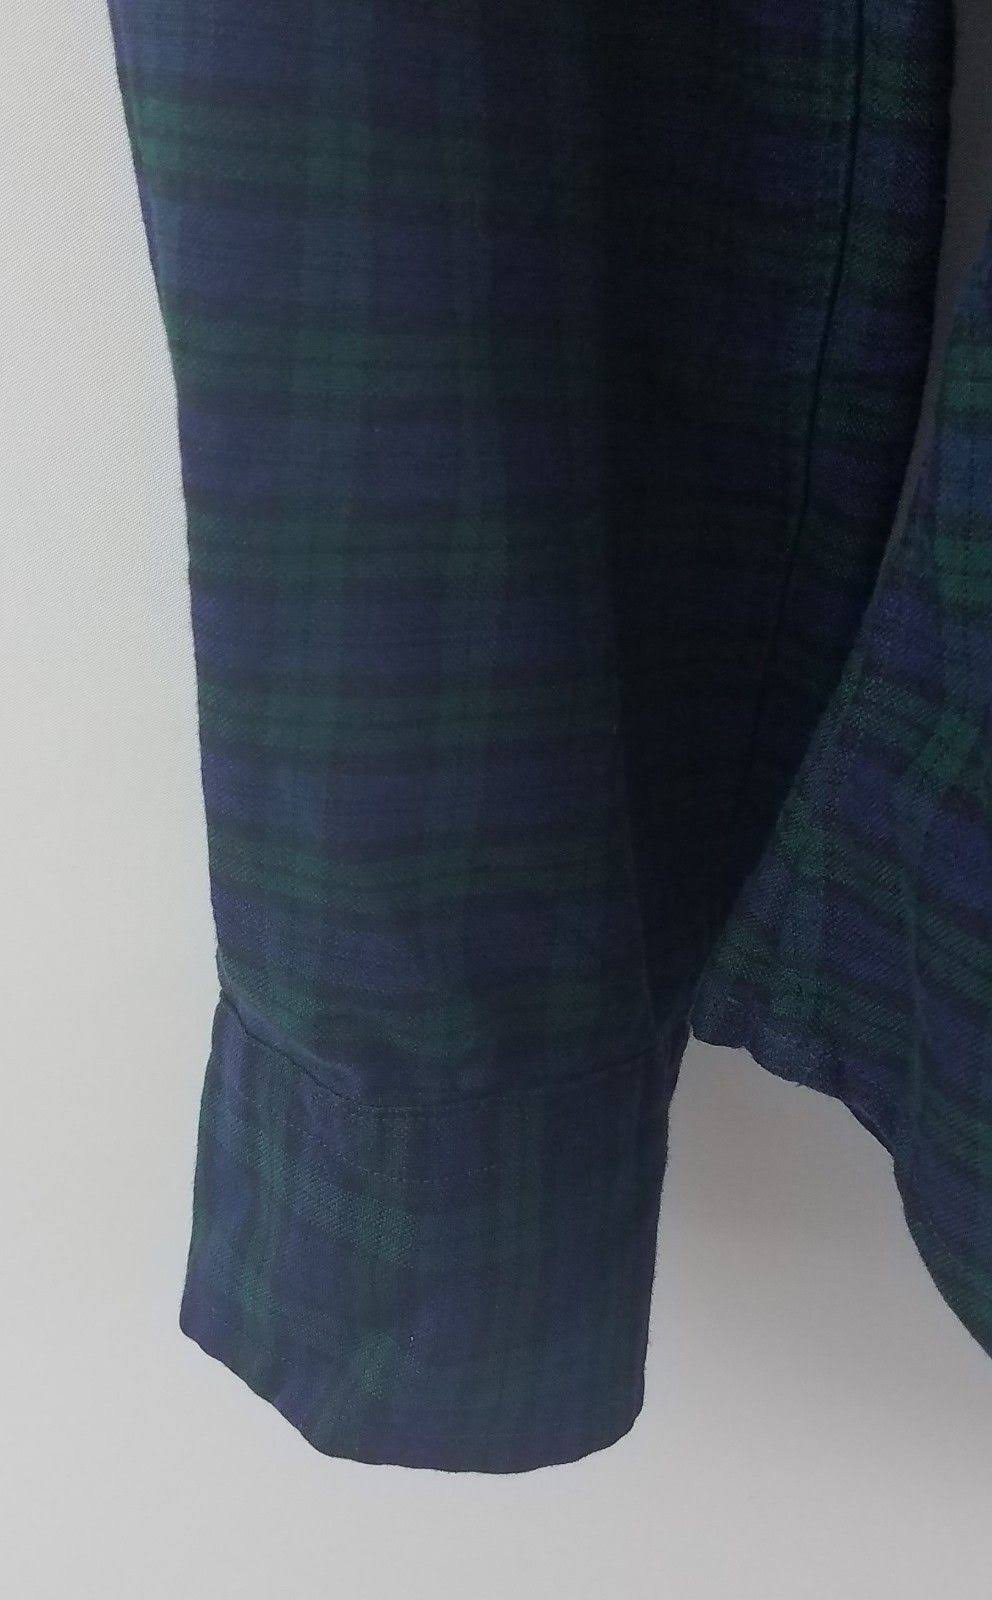 Para Ralph Forestnvy Hombre Con Camisa Oxford S Lauren Botones cTrTqXf